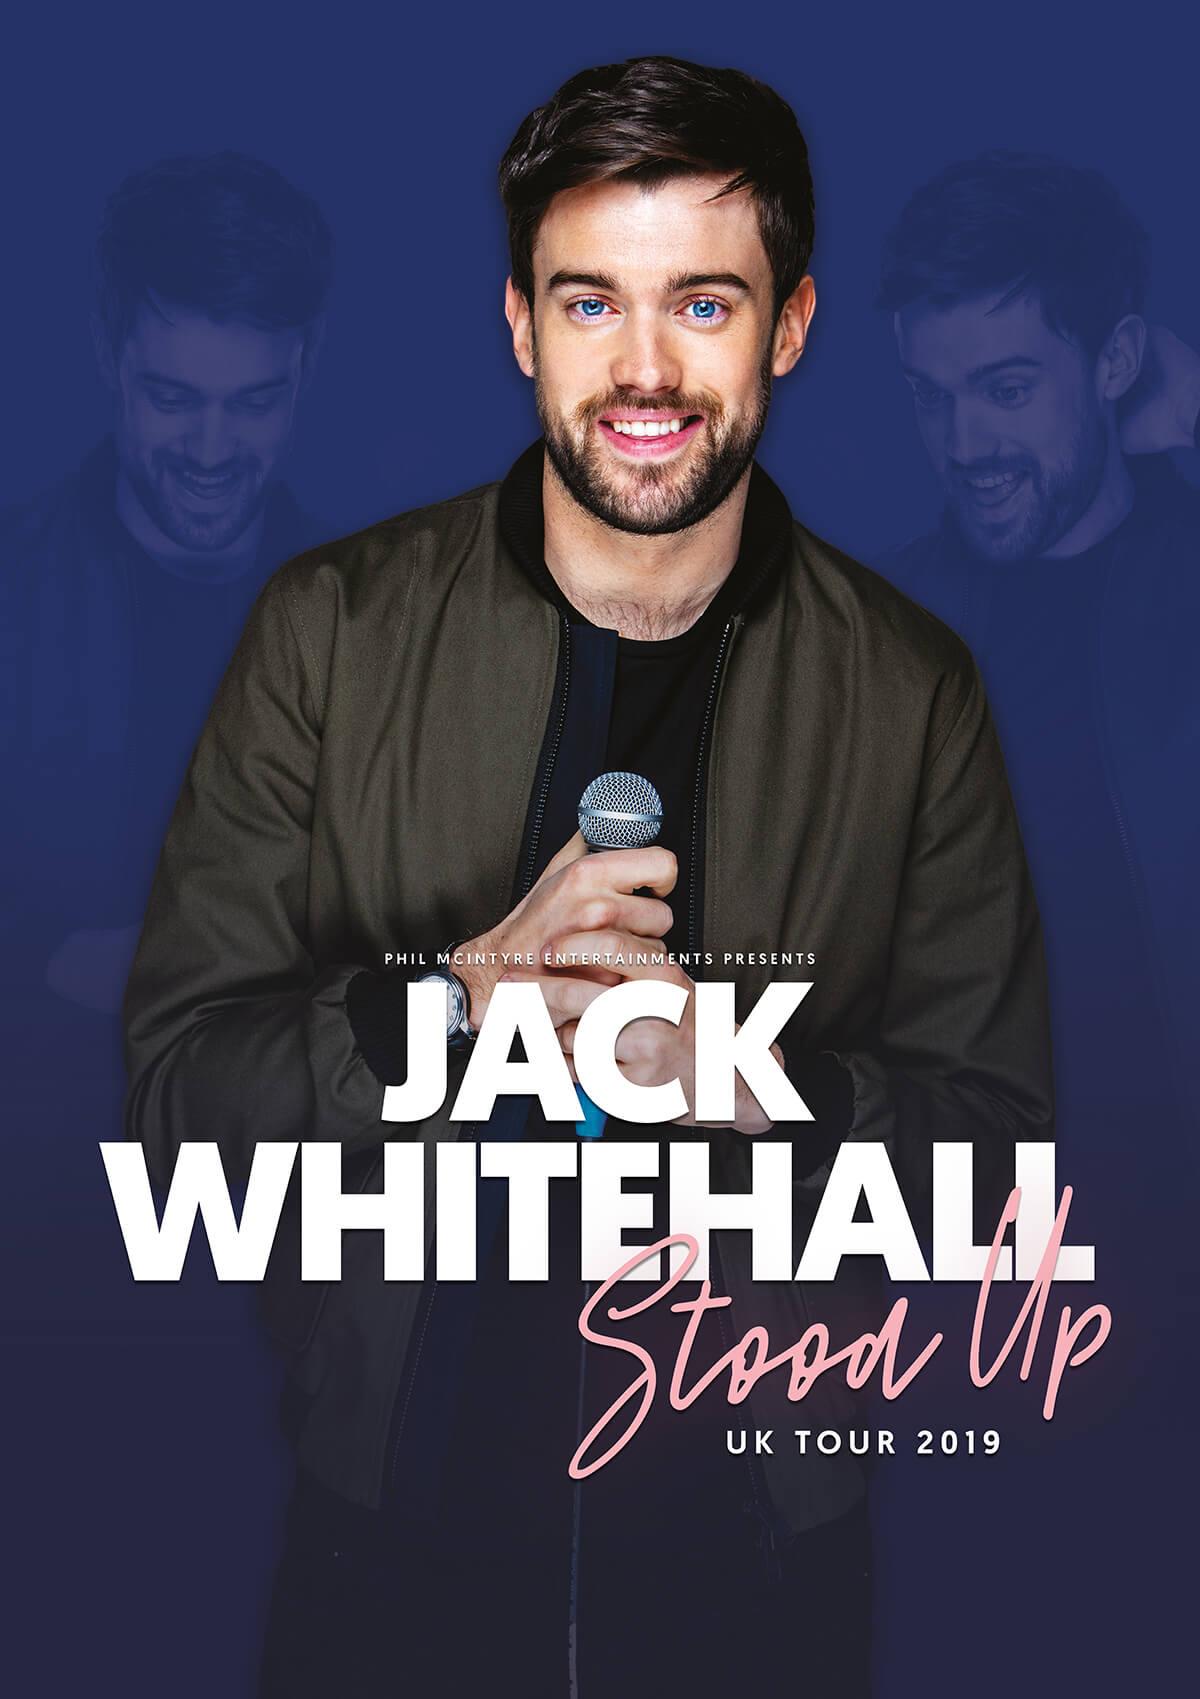 Jack Whitehall: Stood Up | Tour Tickets | See Jack Live